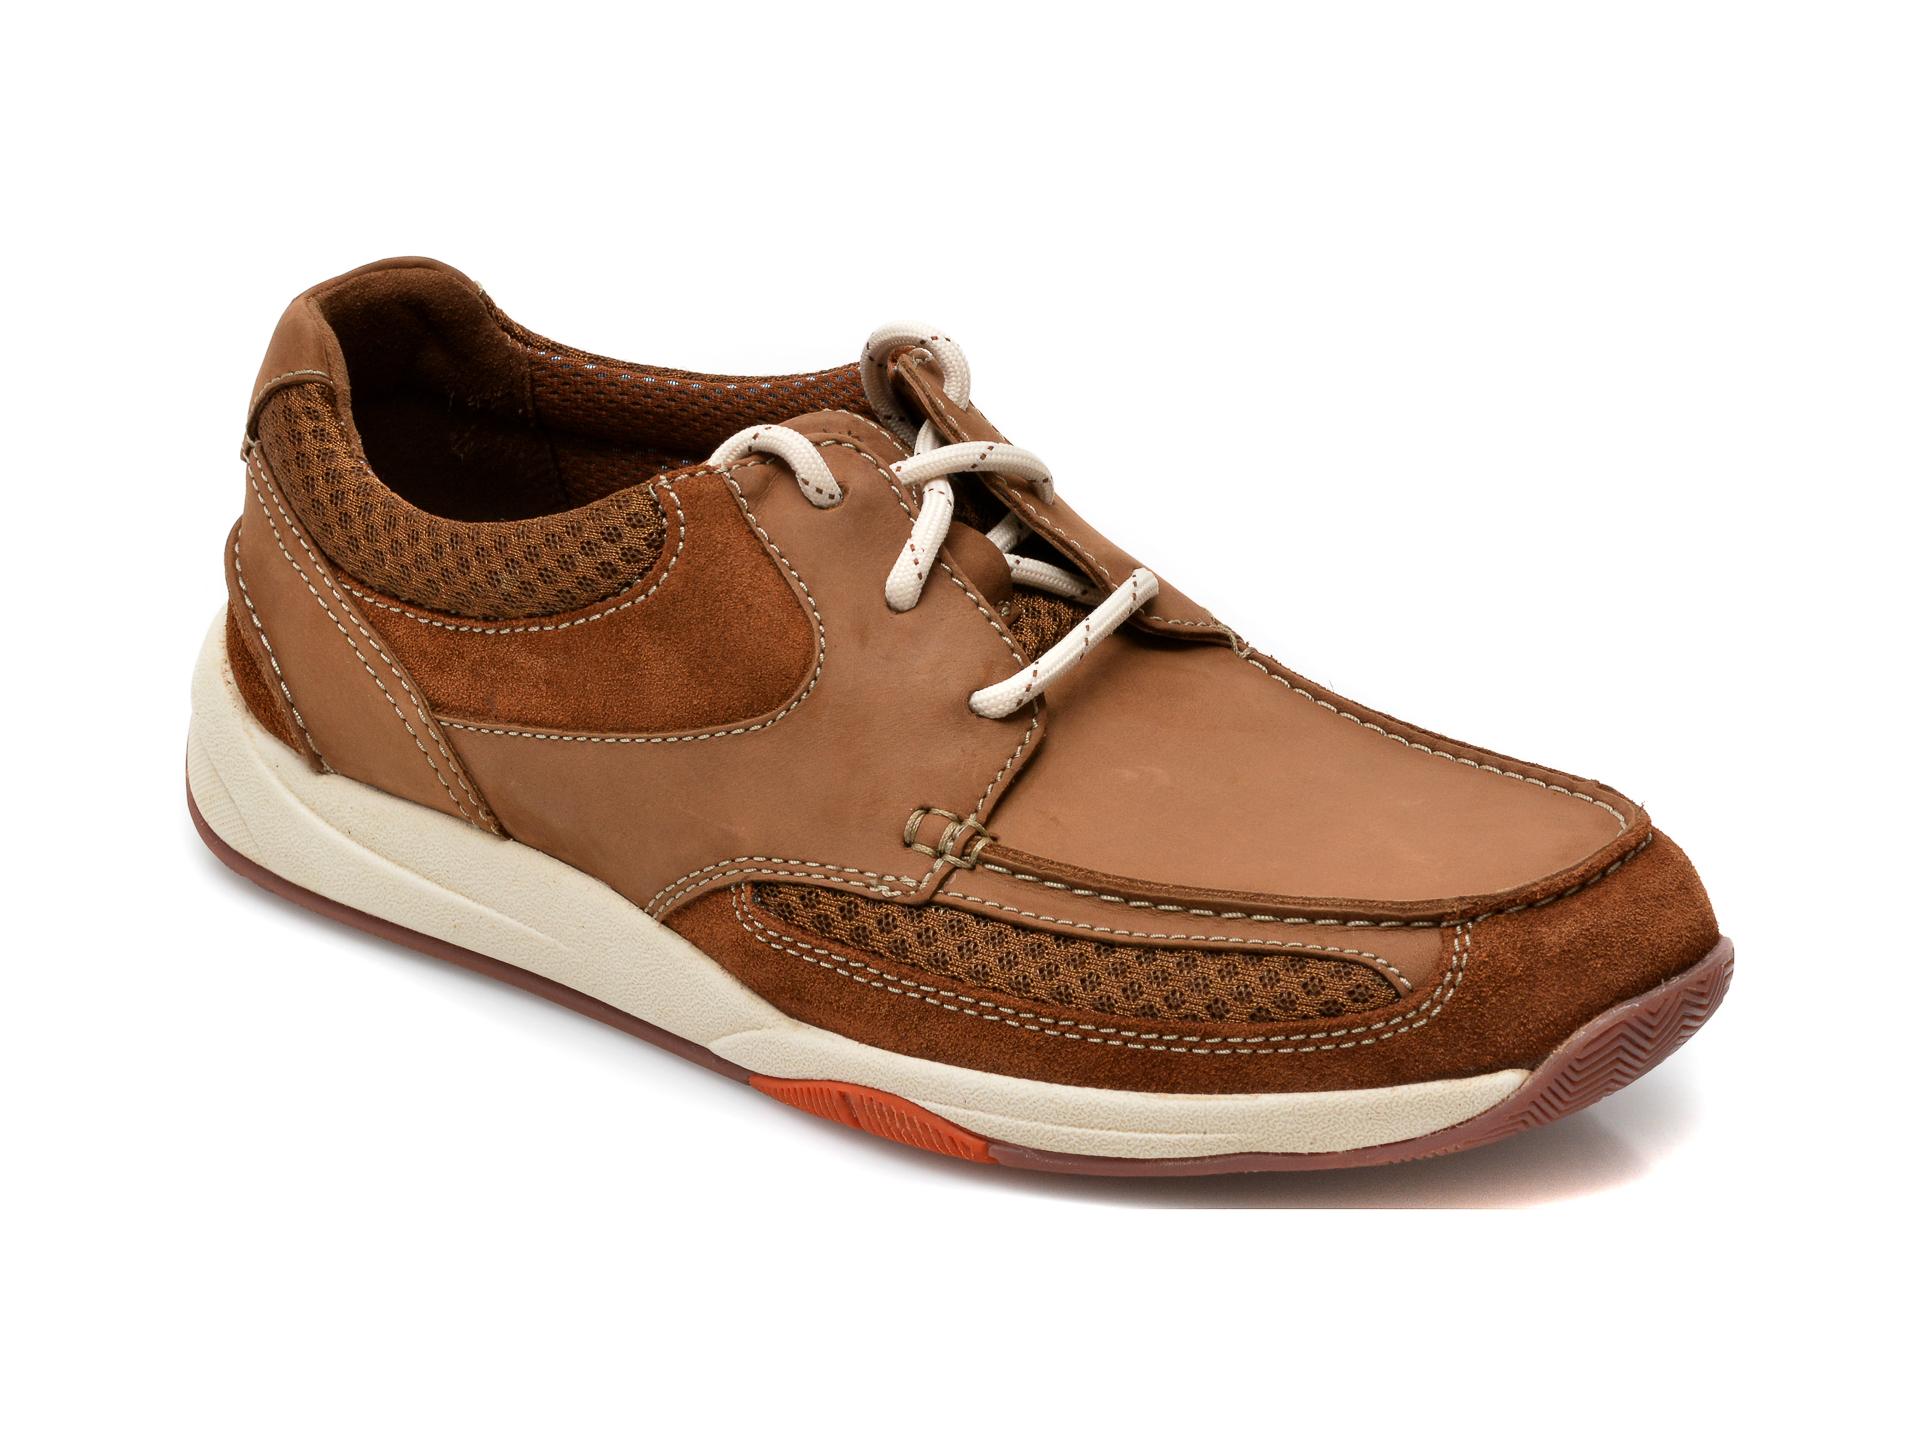 Pantofi CLARKS maro, Langton Lane, din nabuc imagine otter.ro 2021